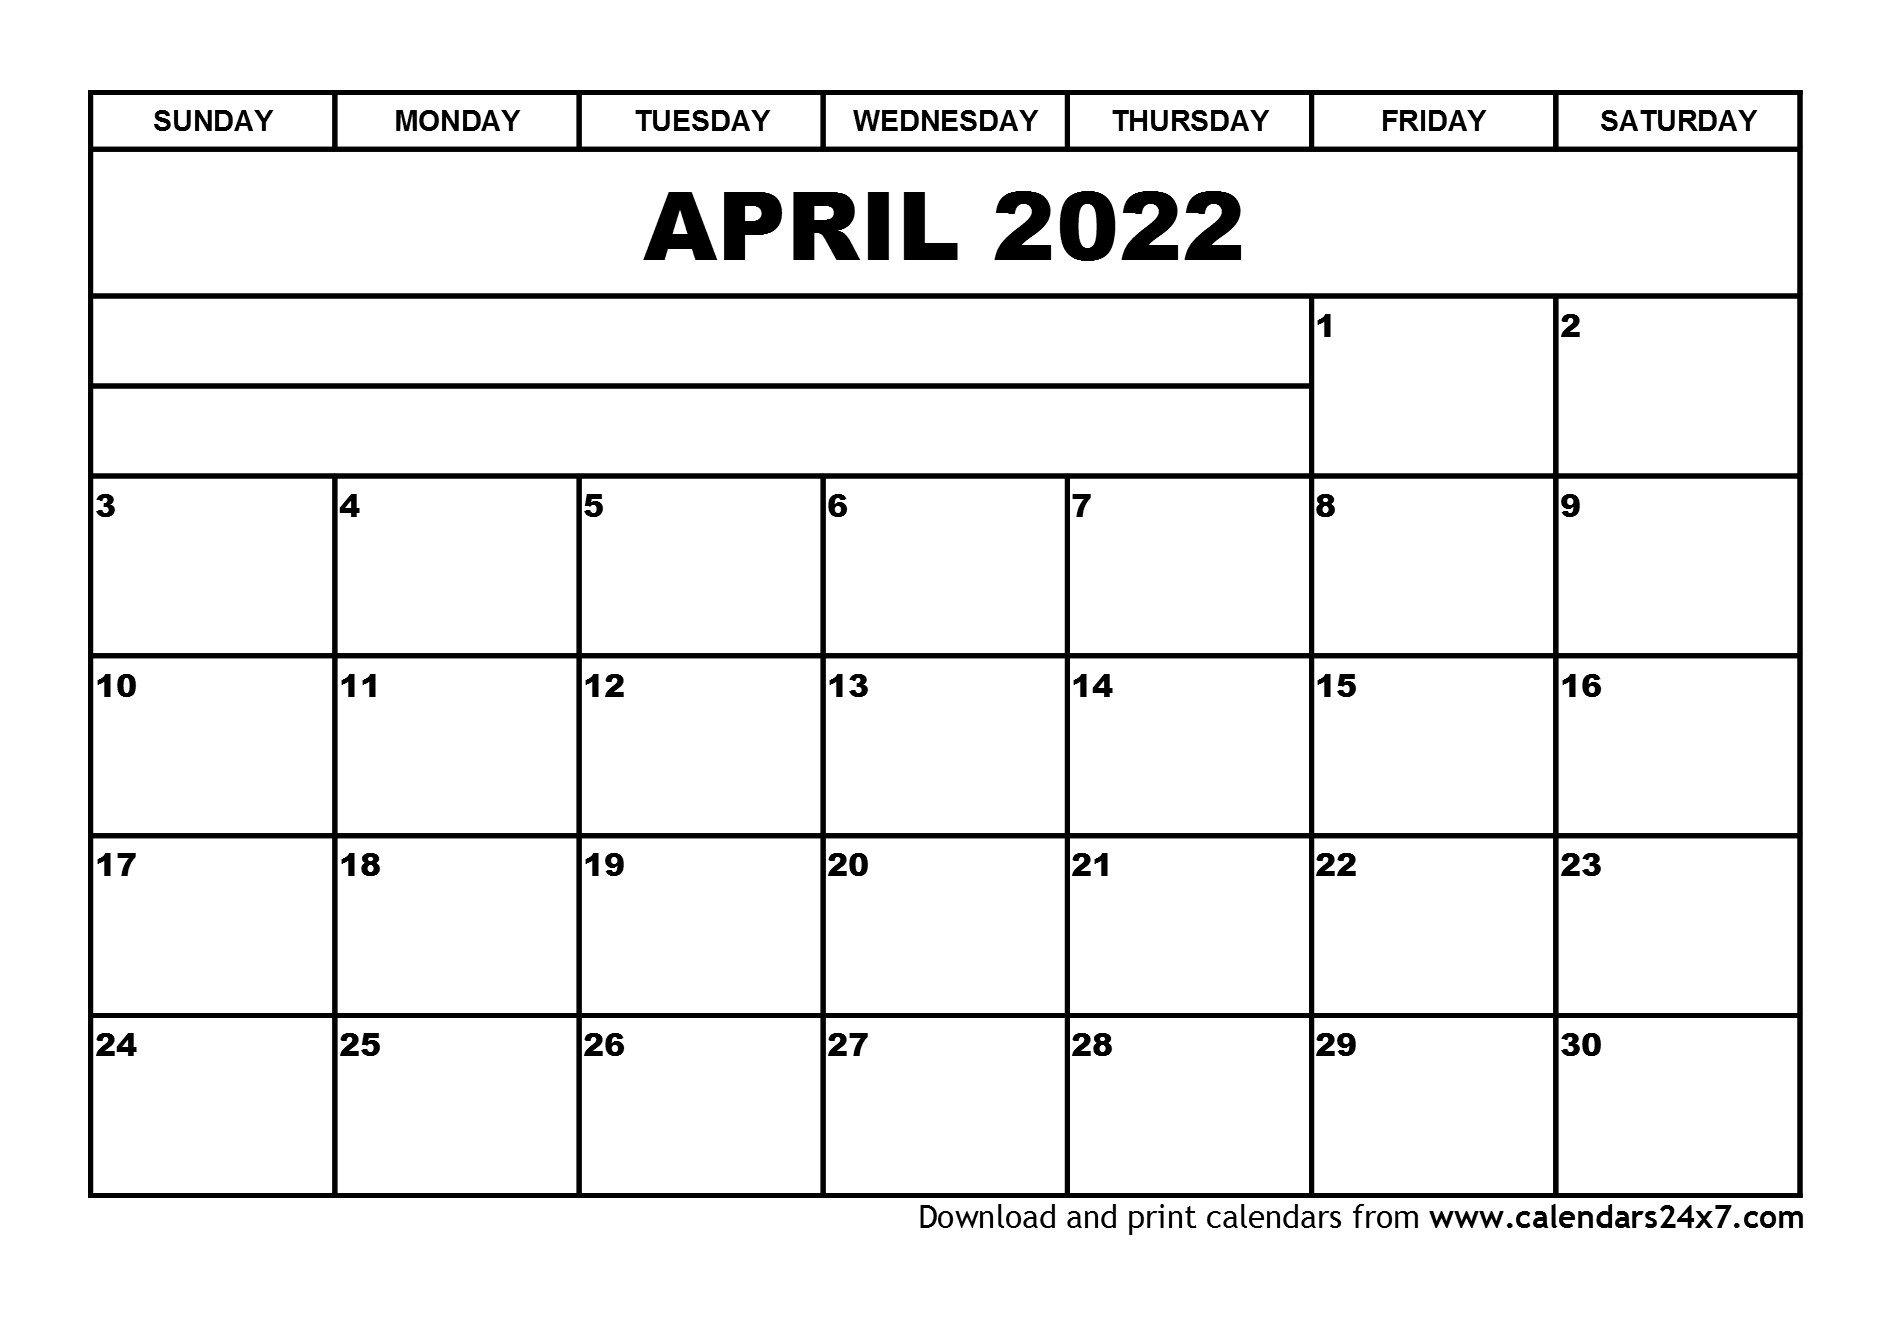 April 2022 Calendar & May 2022 Calendar for Printable April 2022 Calendar Template Free